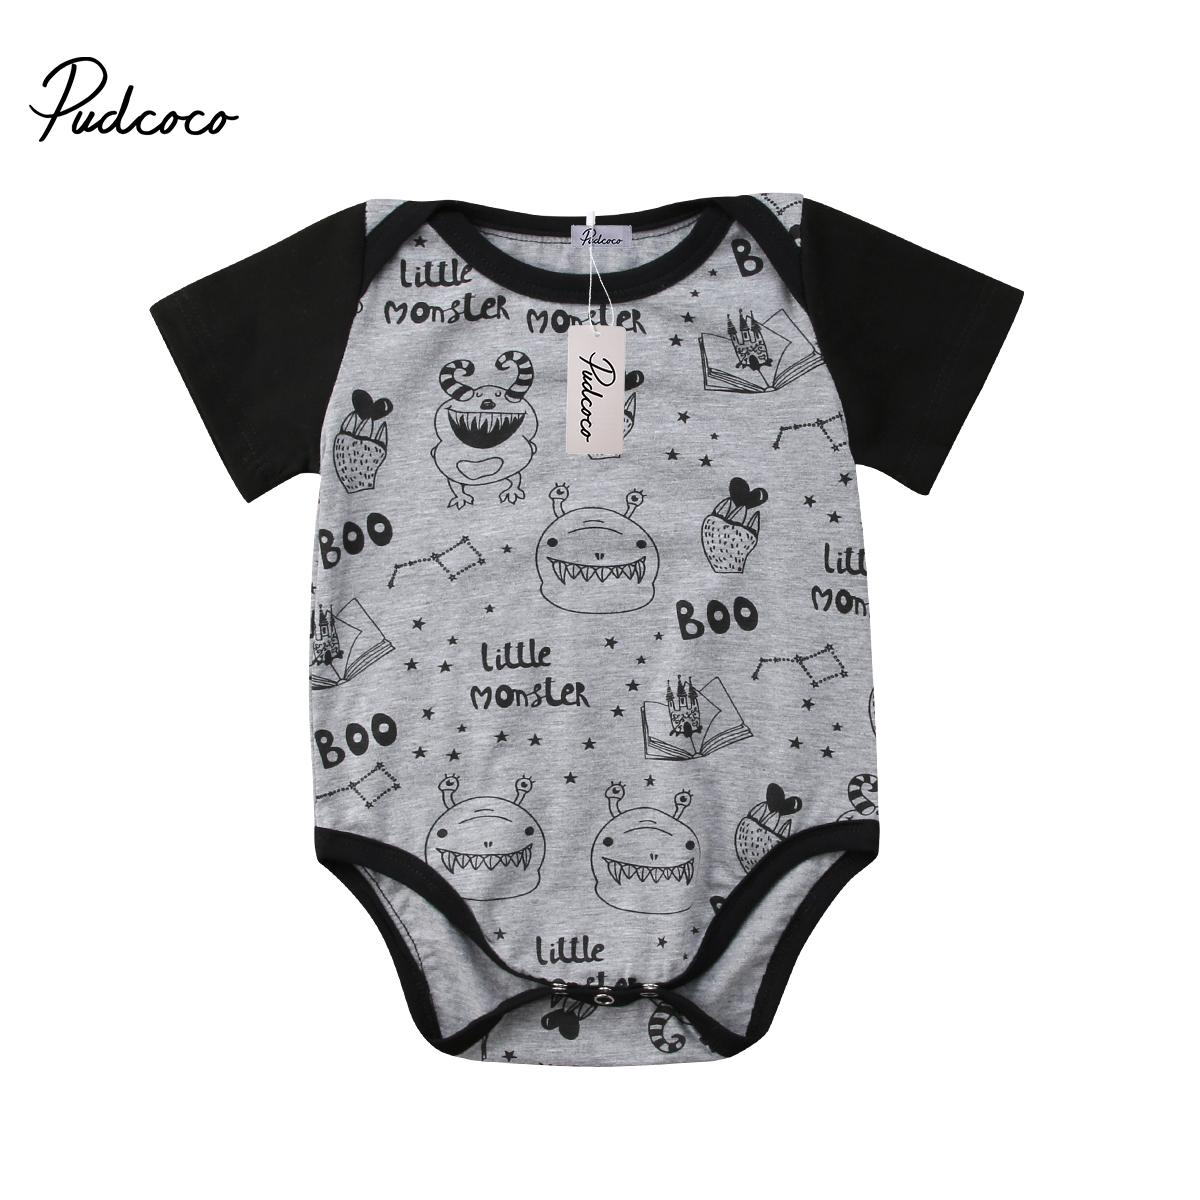 Neugeborenes Kind-Baby-Mädchen-Cartoon Short Sleeve-Strampler Babys Printing Bodysuits Outfits Kleidung 0-18M